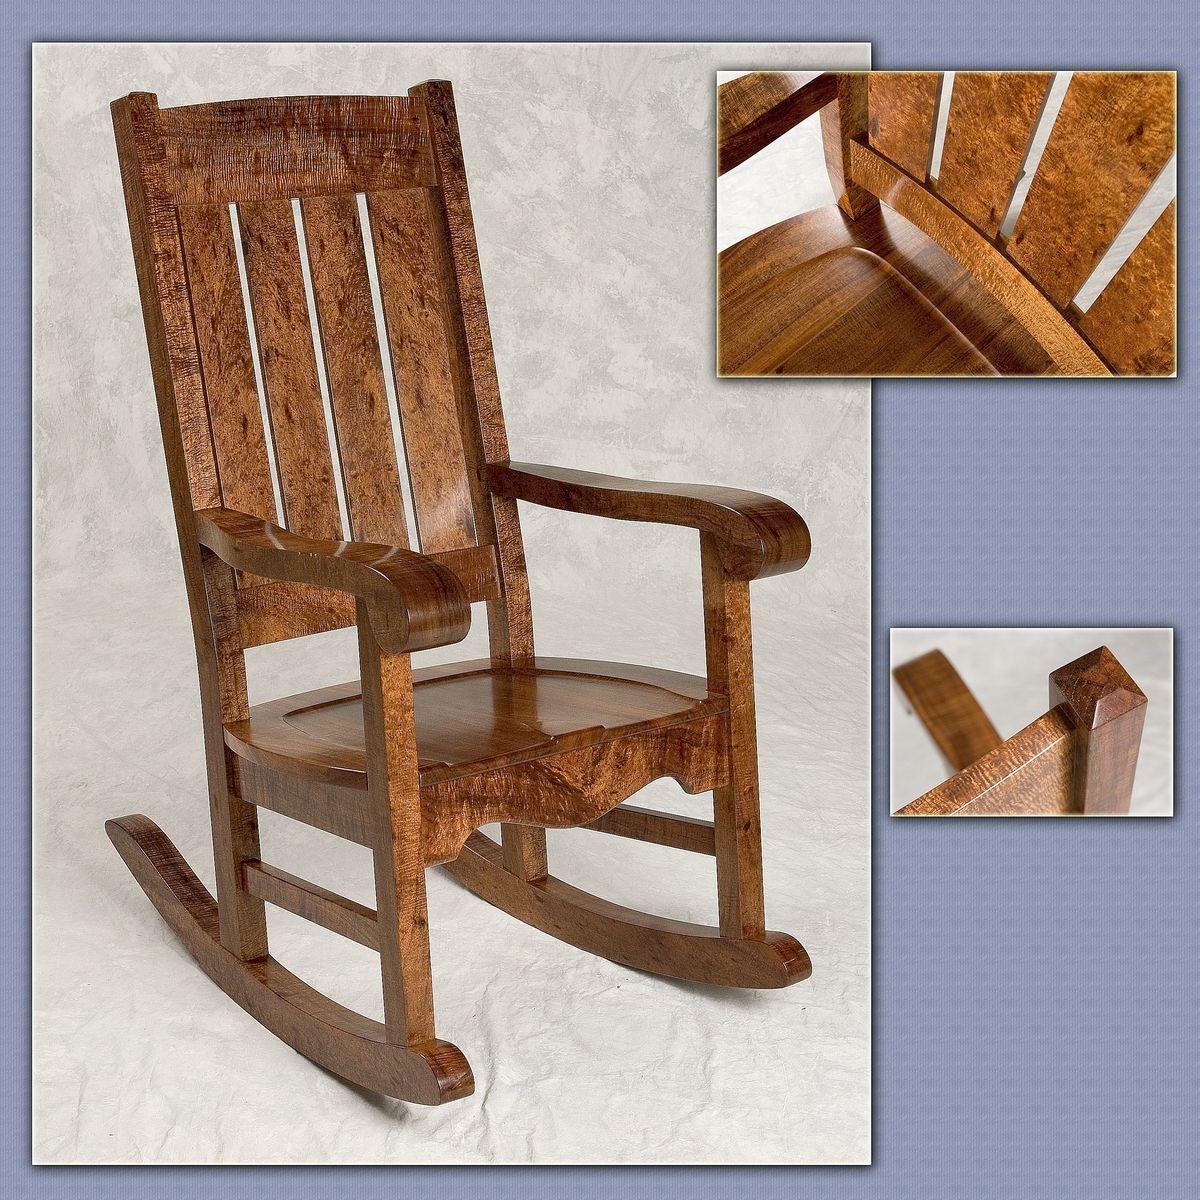 Fine Hand Crafted Hawaiian Curly Koa Mission Style Rocker By Machost Co Dining Chair Design Ideas Machostcouk